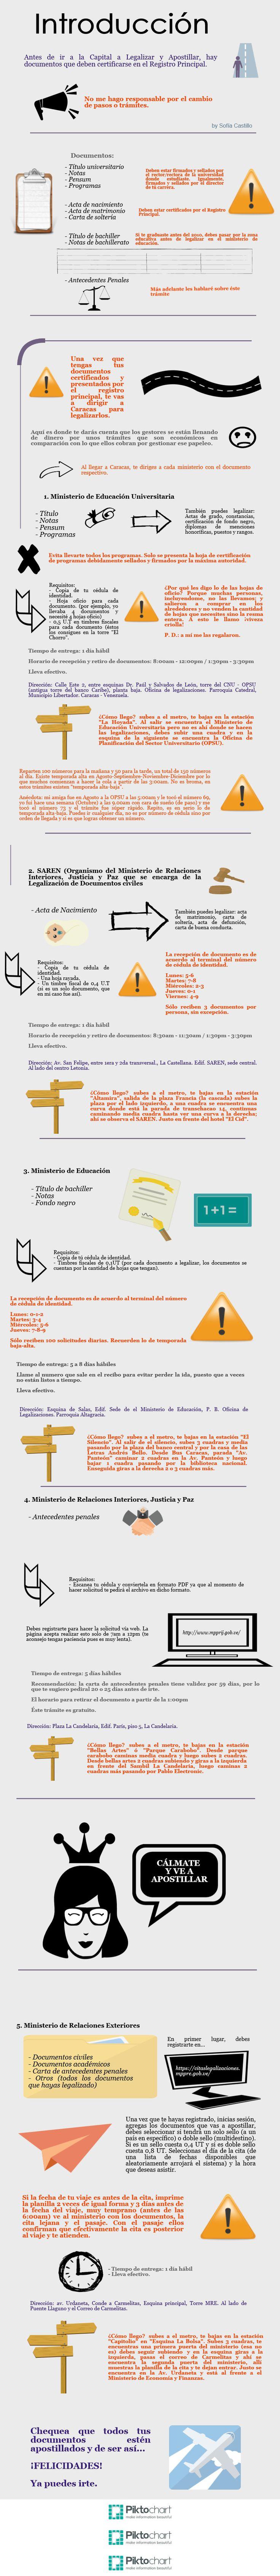 Venezuela / Tramites de Documentos para emigrar. Apostillar Documentos. #Venezuela